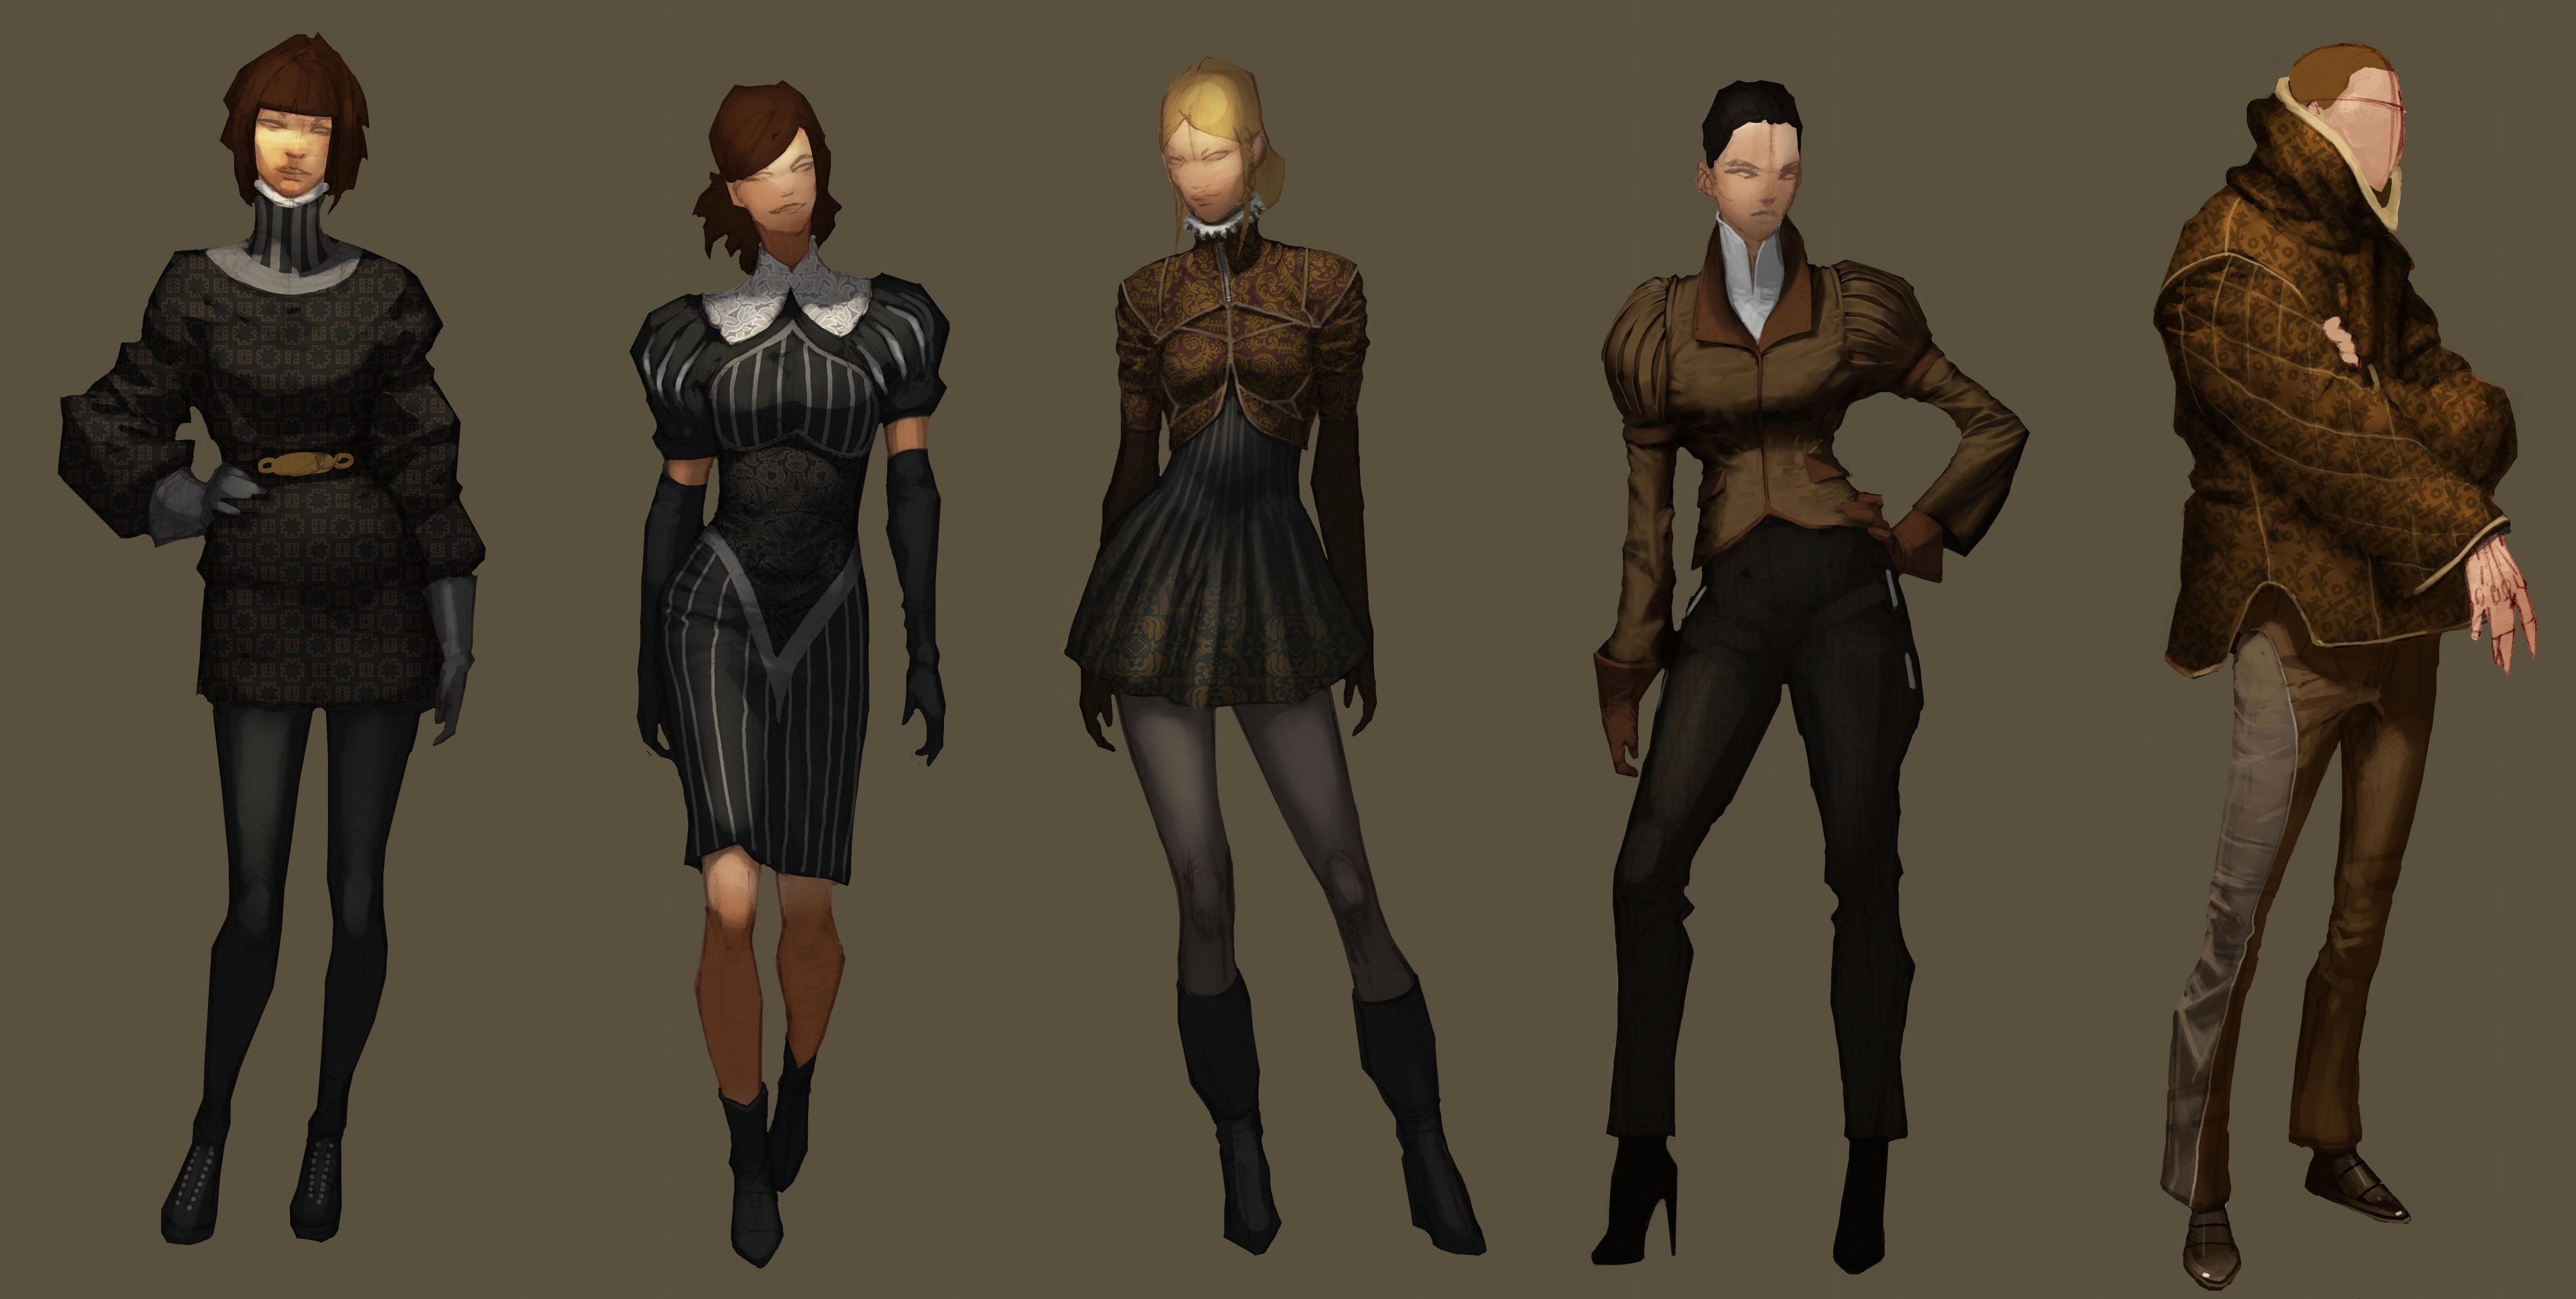 Character And Npc Design : Npc fashion image deus ex human revolution mod db